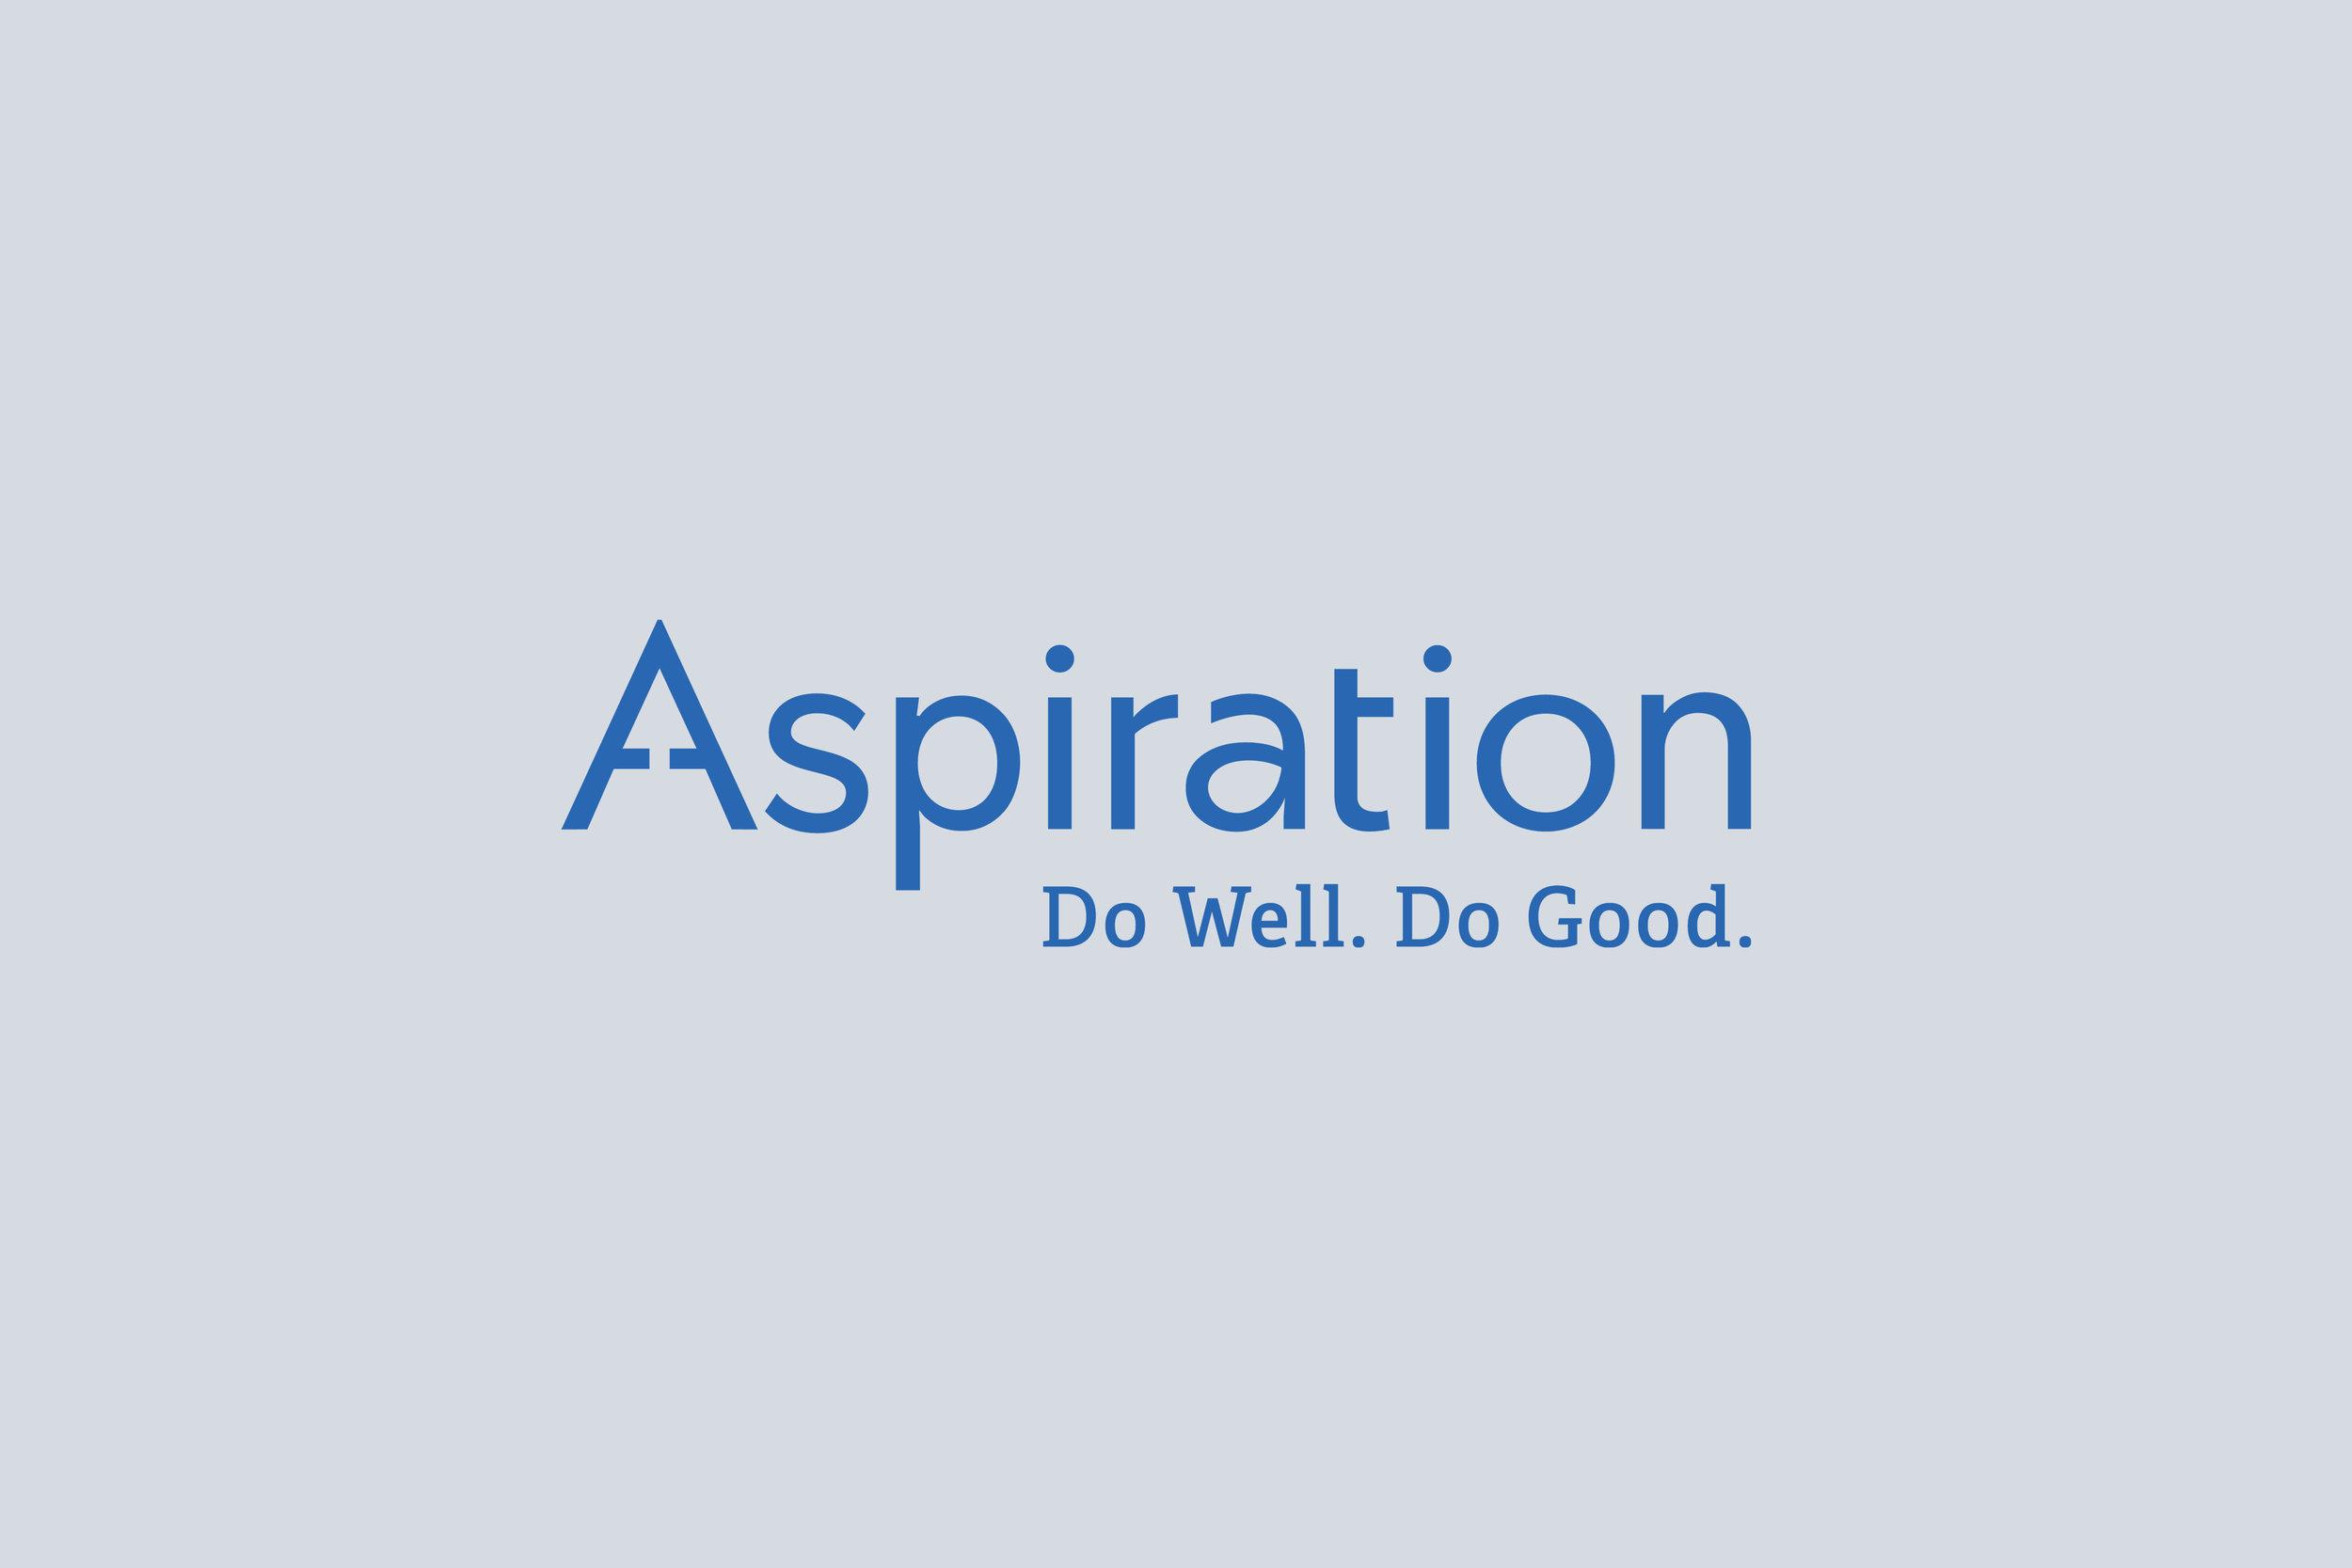 aspiration.jpg